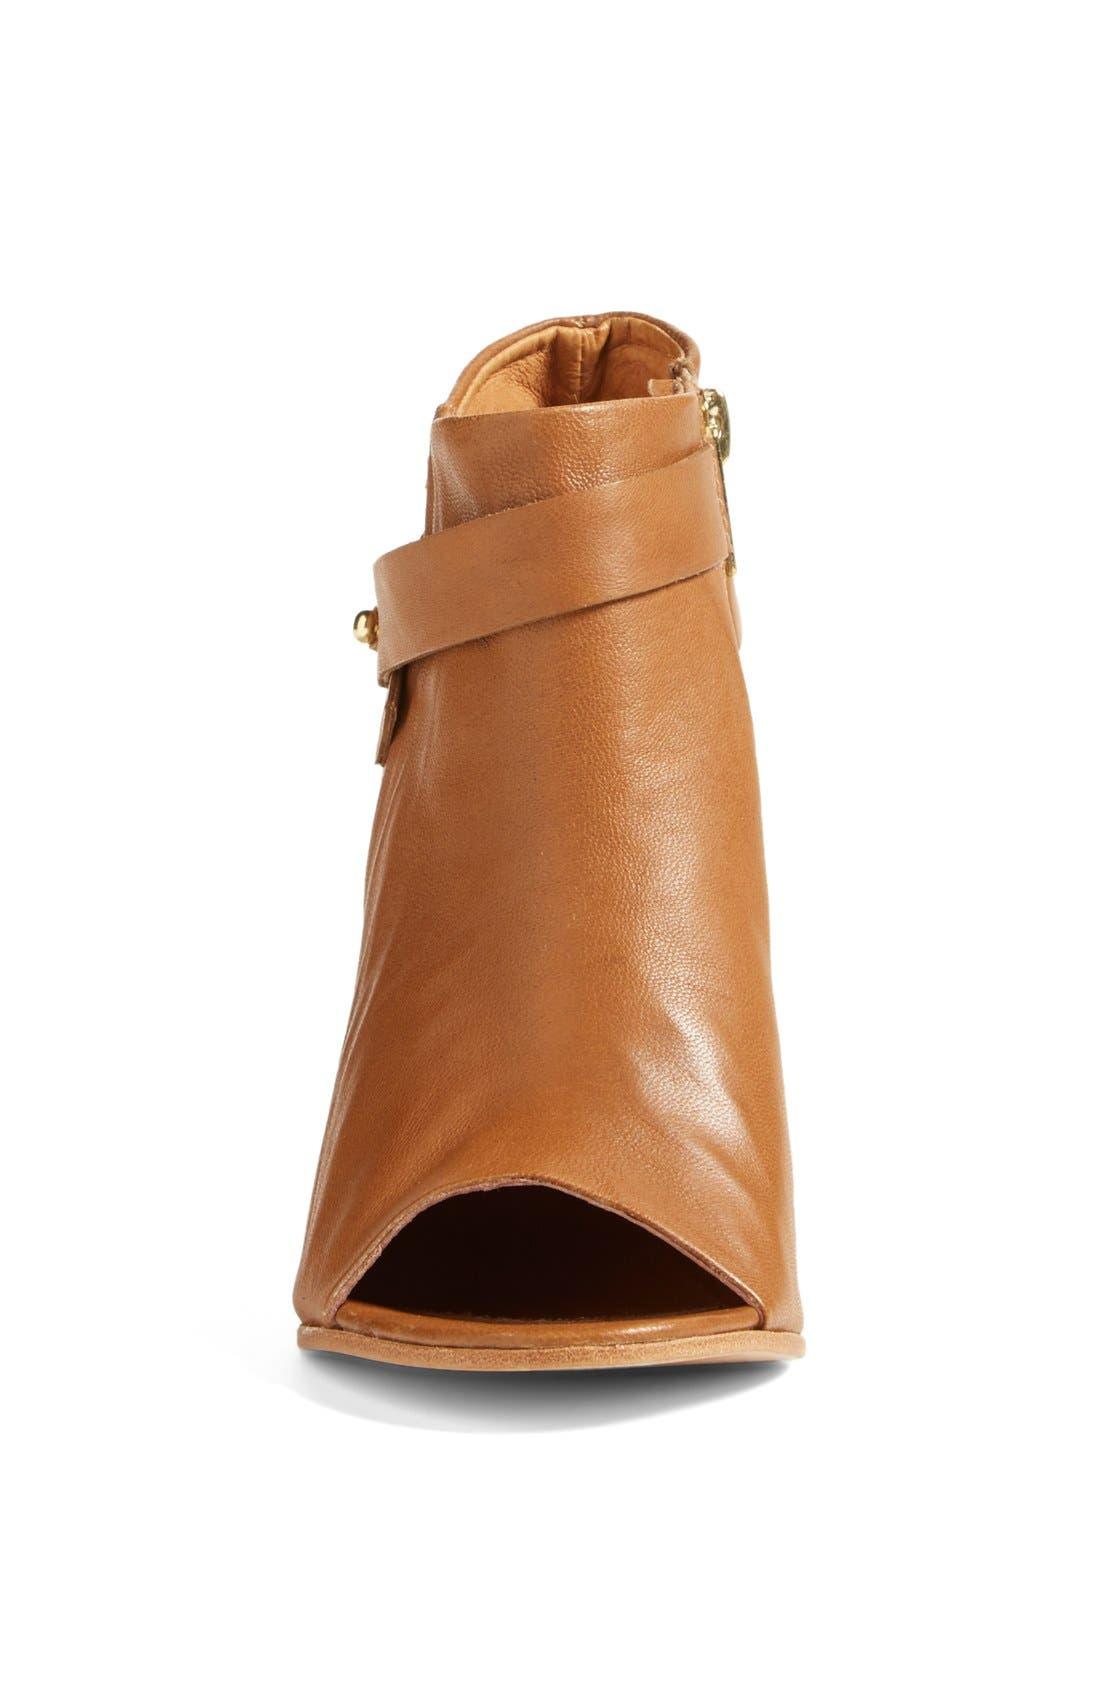 Alternate Image 3  - Steve Madden 'Now' Open Toe Bootie (Women)